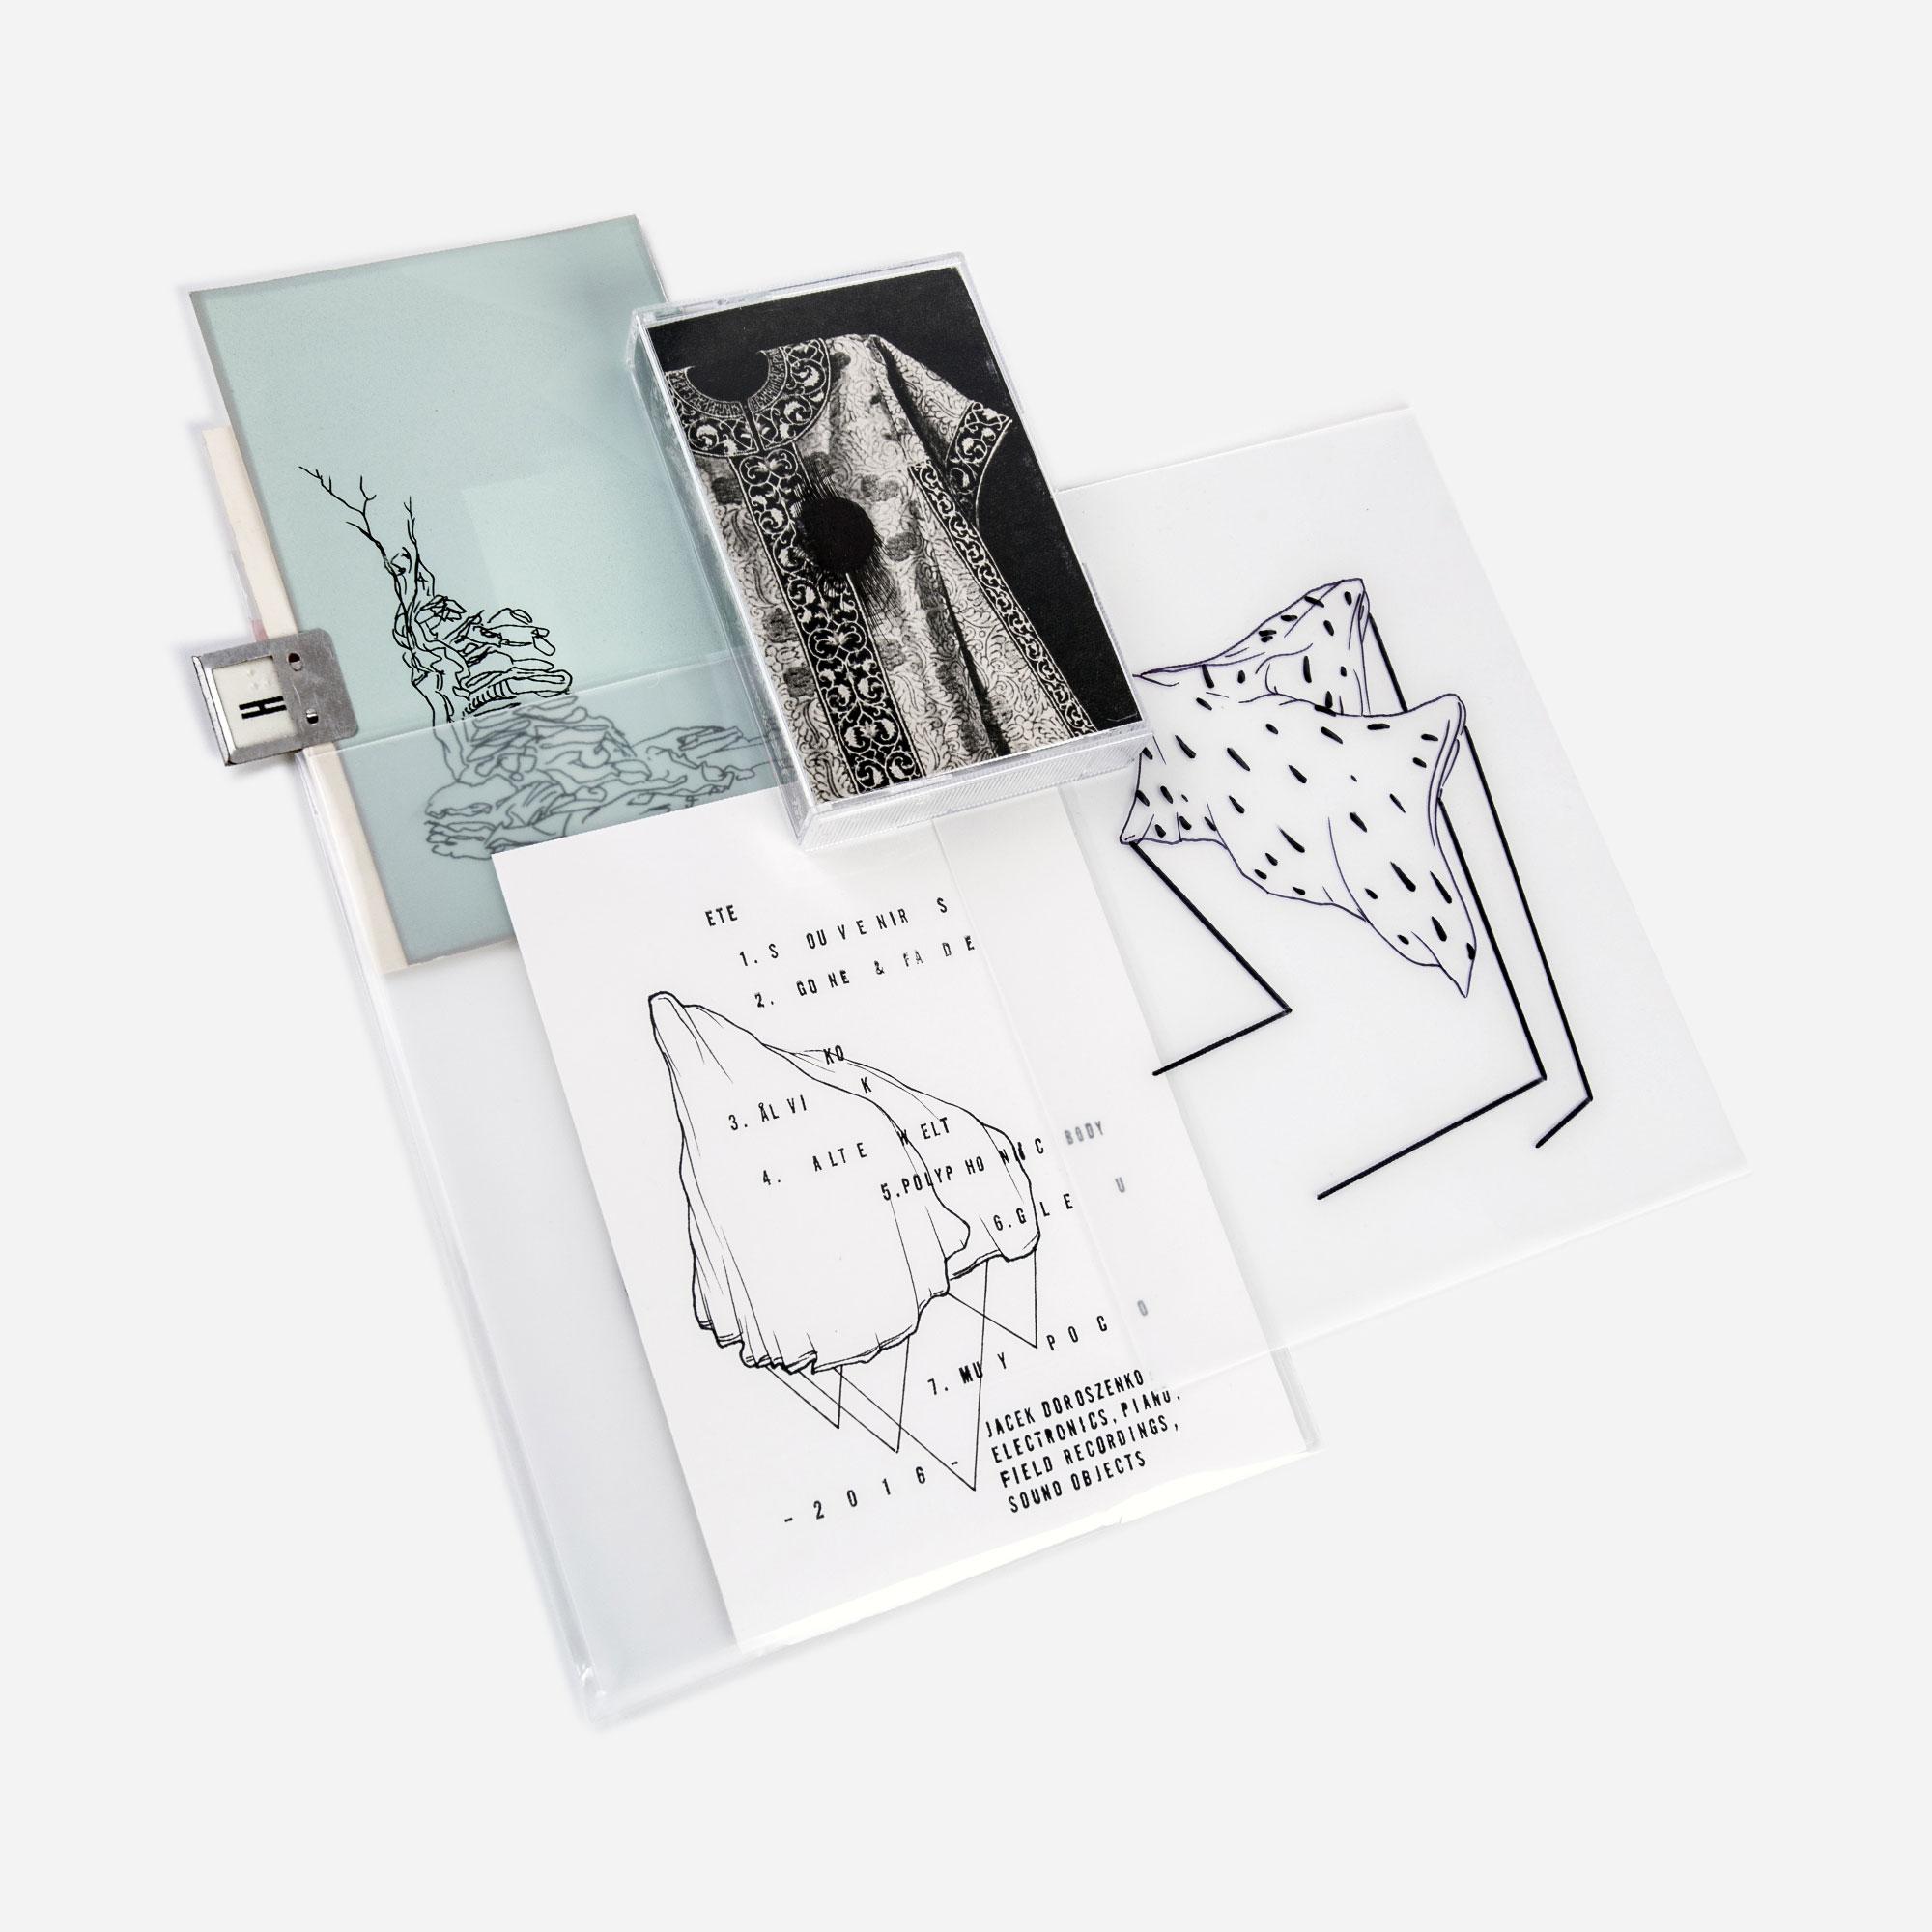 Jacek Doroszenko - Useful Remnants, music album 01